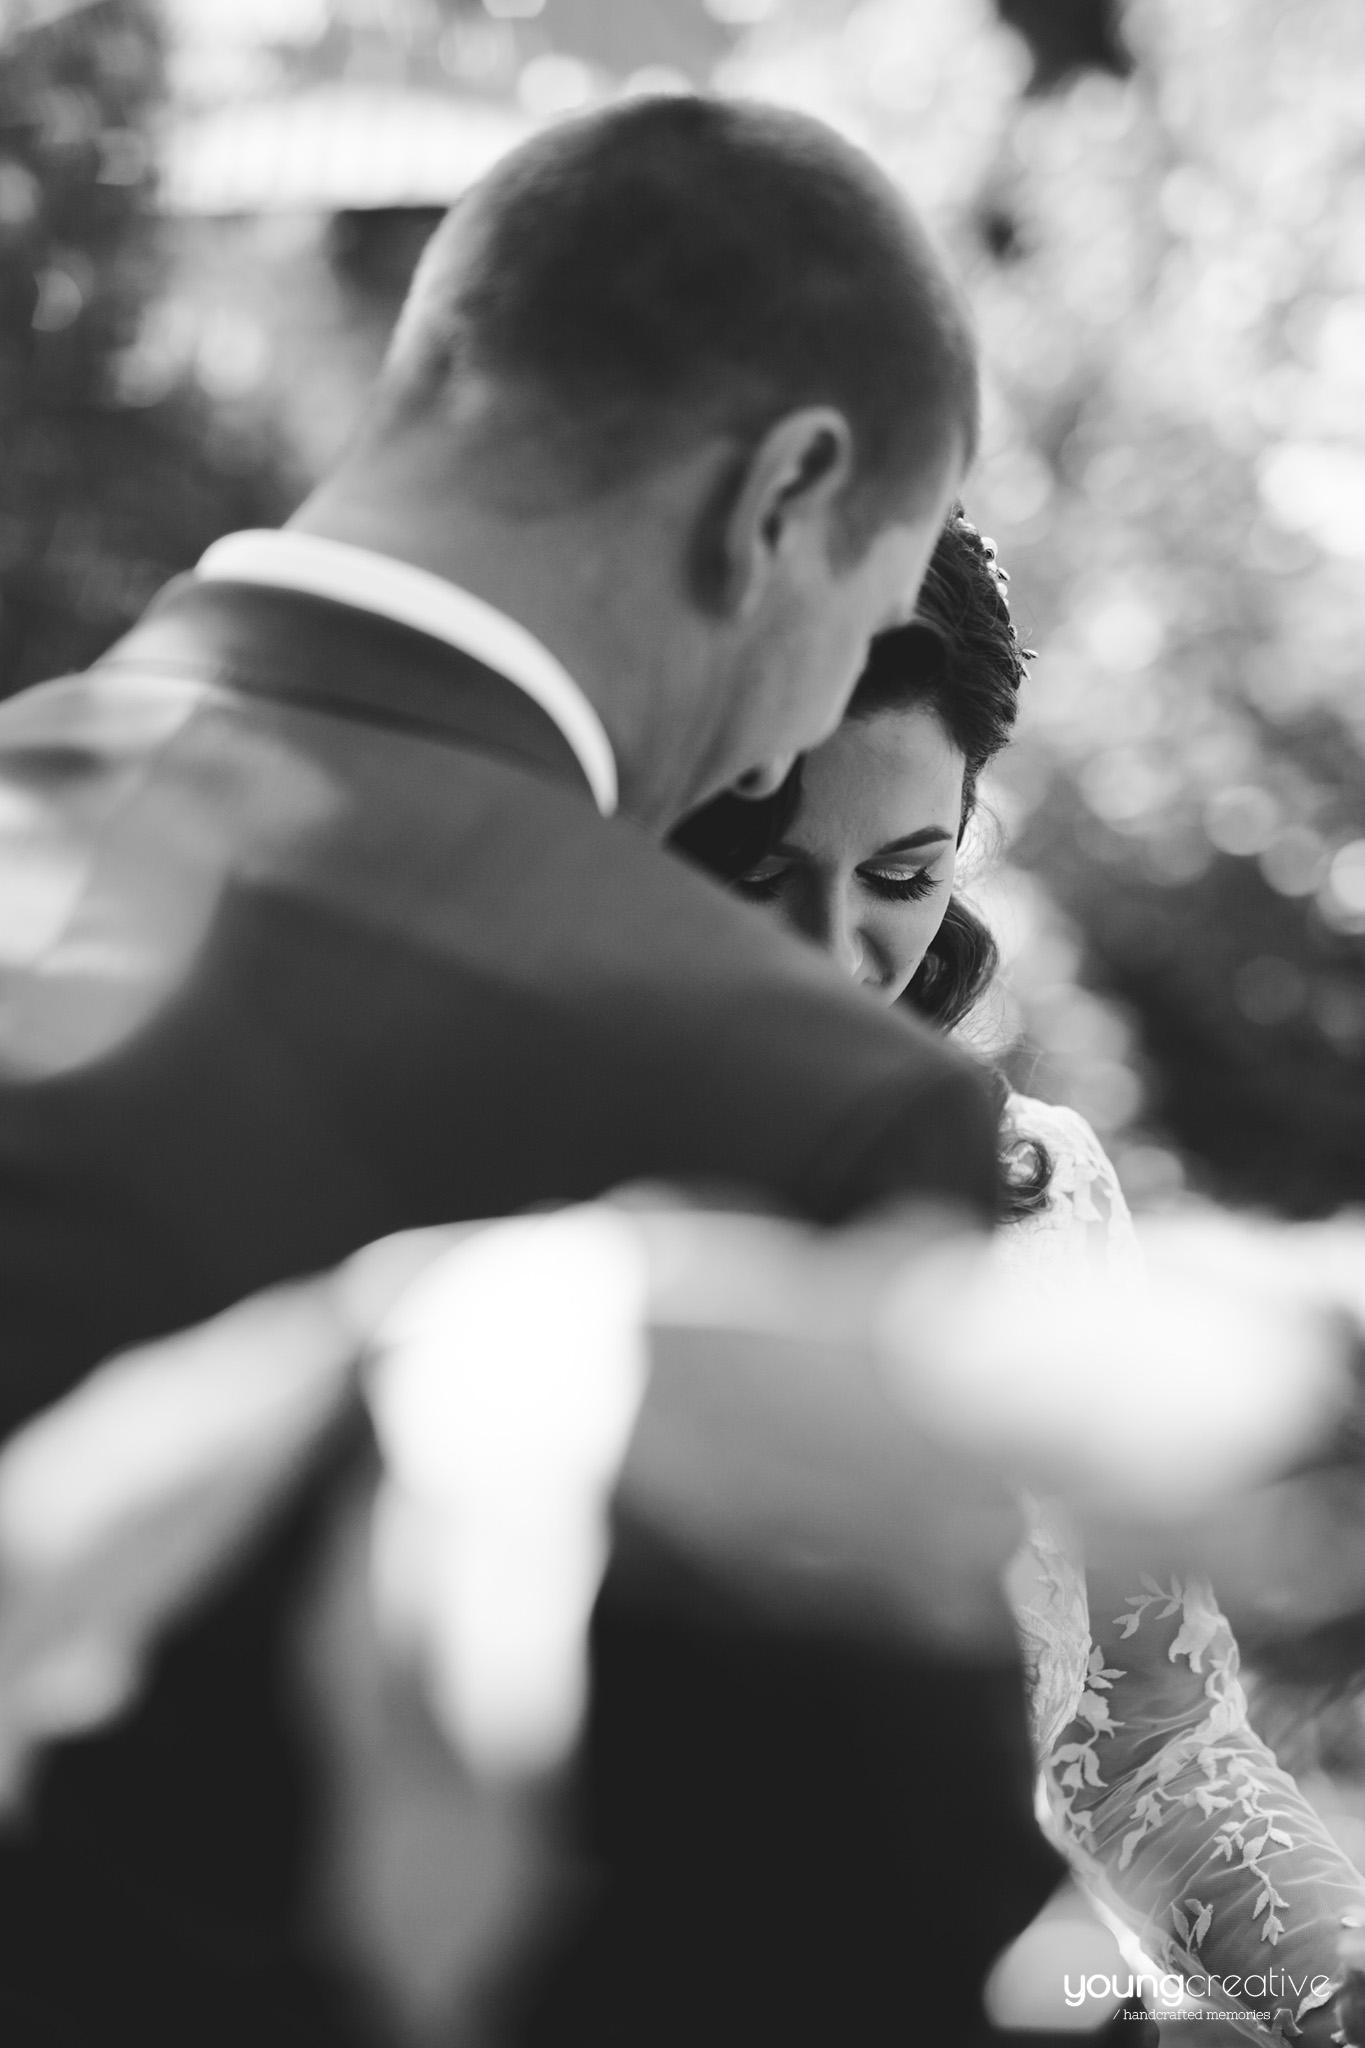 Carmen & Alin | youngcreative.info media © Dan Filipciuc, Cristina Bejan | fotografie nunta Iasi